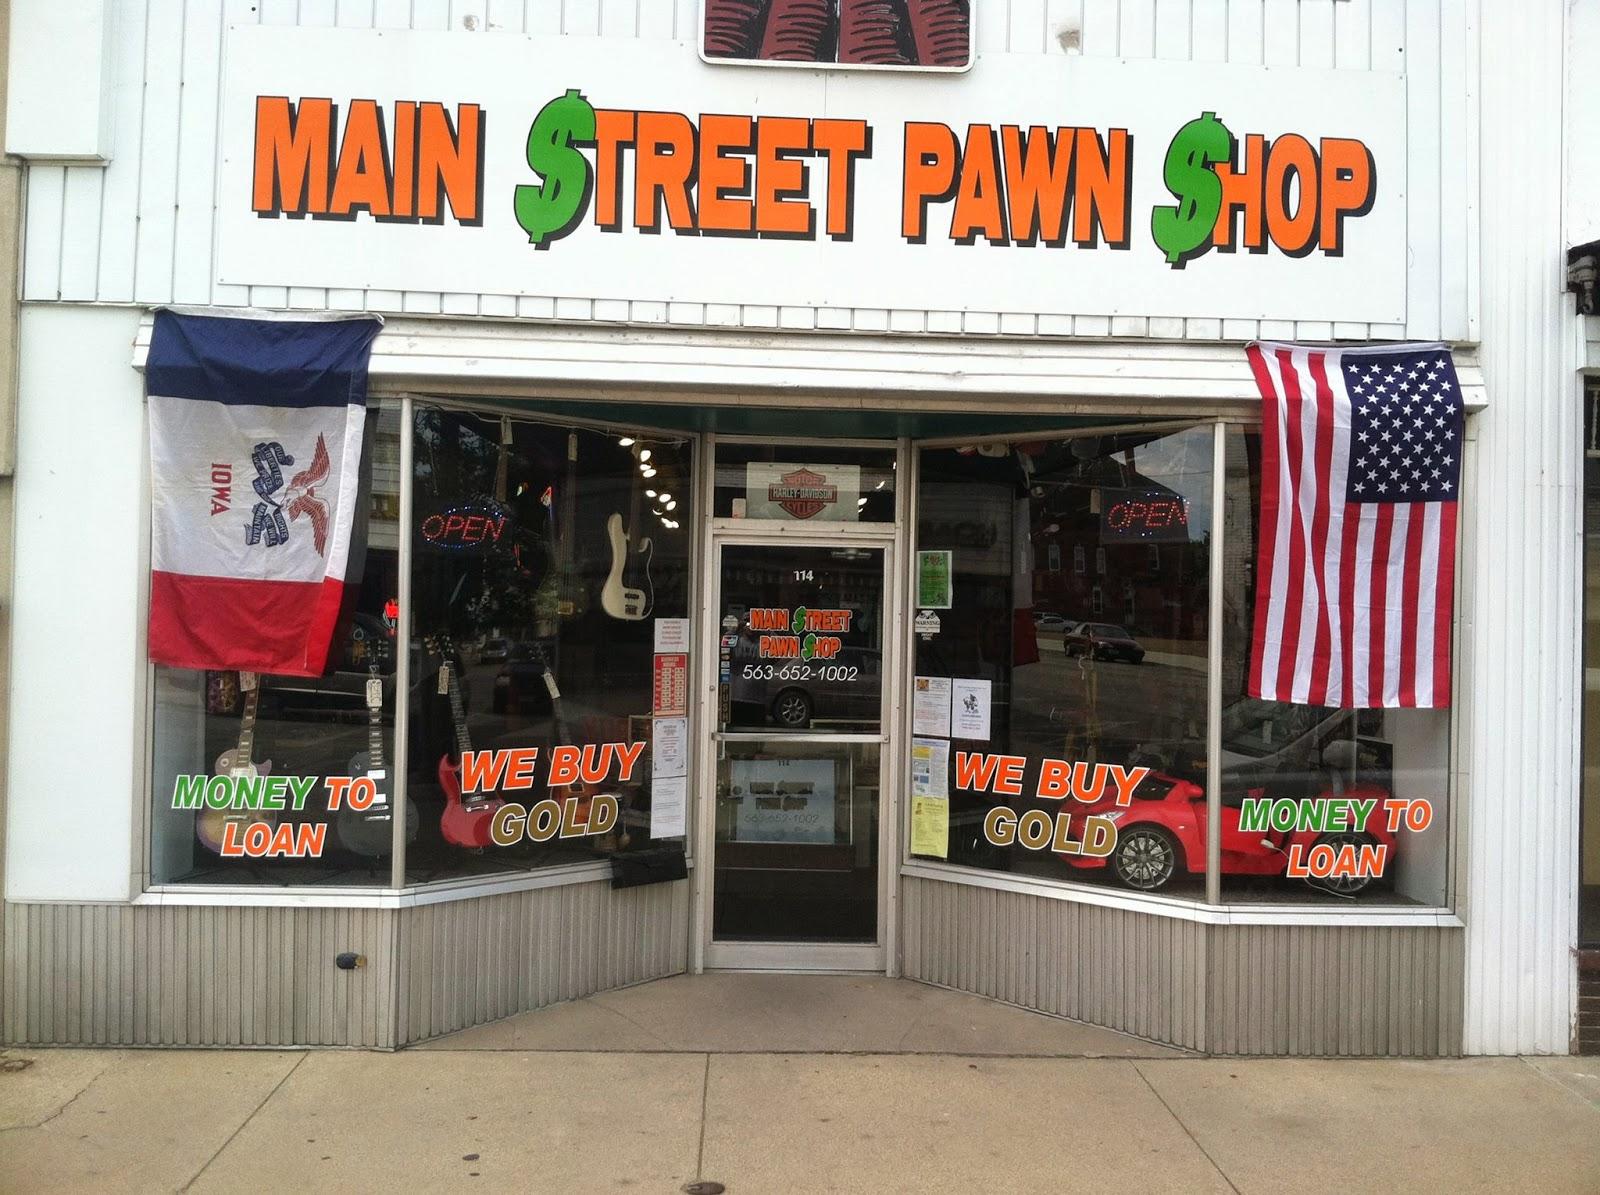 https://www.facebook.com/pages/Maquoketa-Main-Street-Pawn-Shop/320153668001798